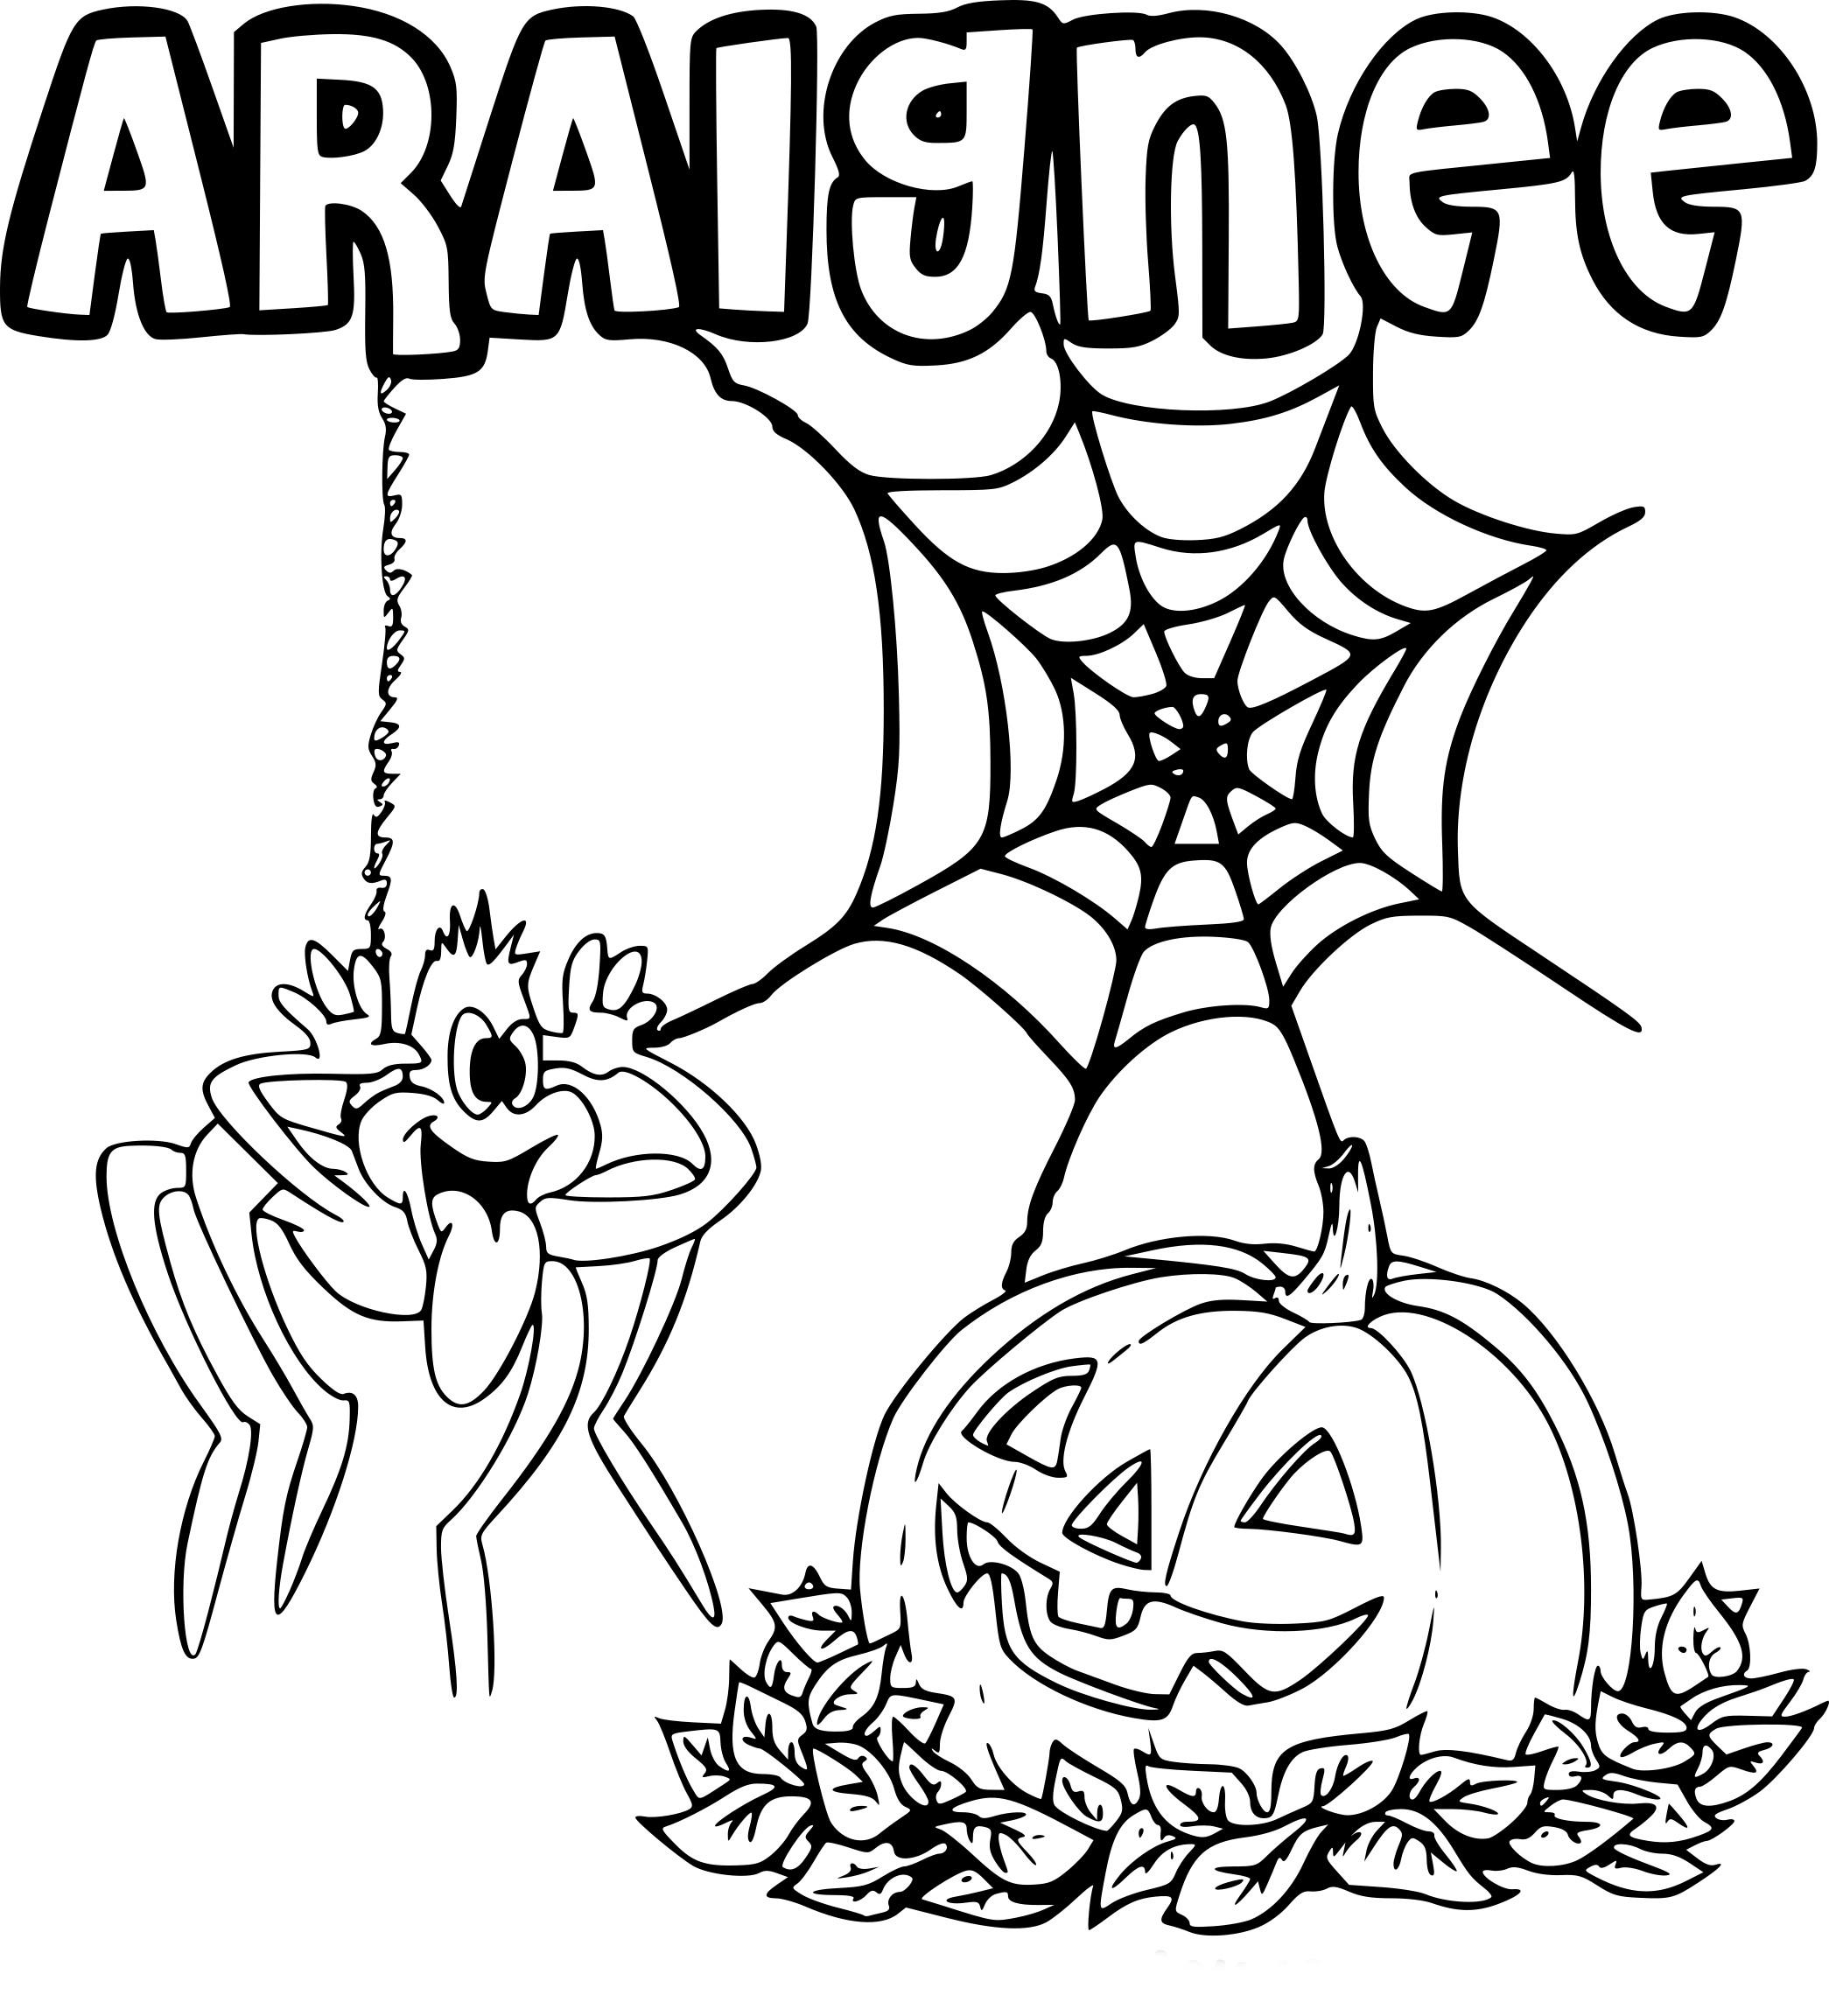 Coloriage Araignée Halloween À Imprimer concernant Coloriages Halloween À Imprimer Gratuitement